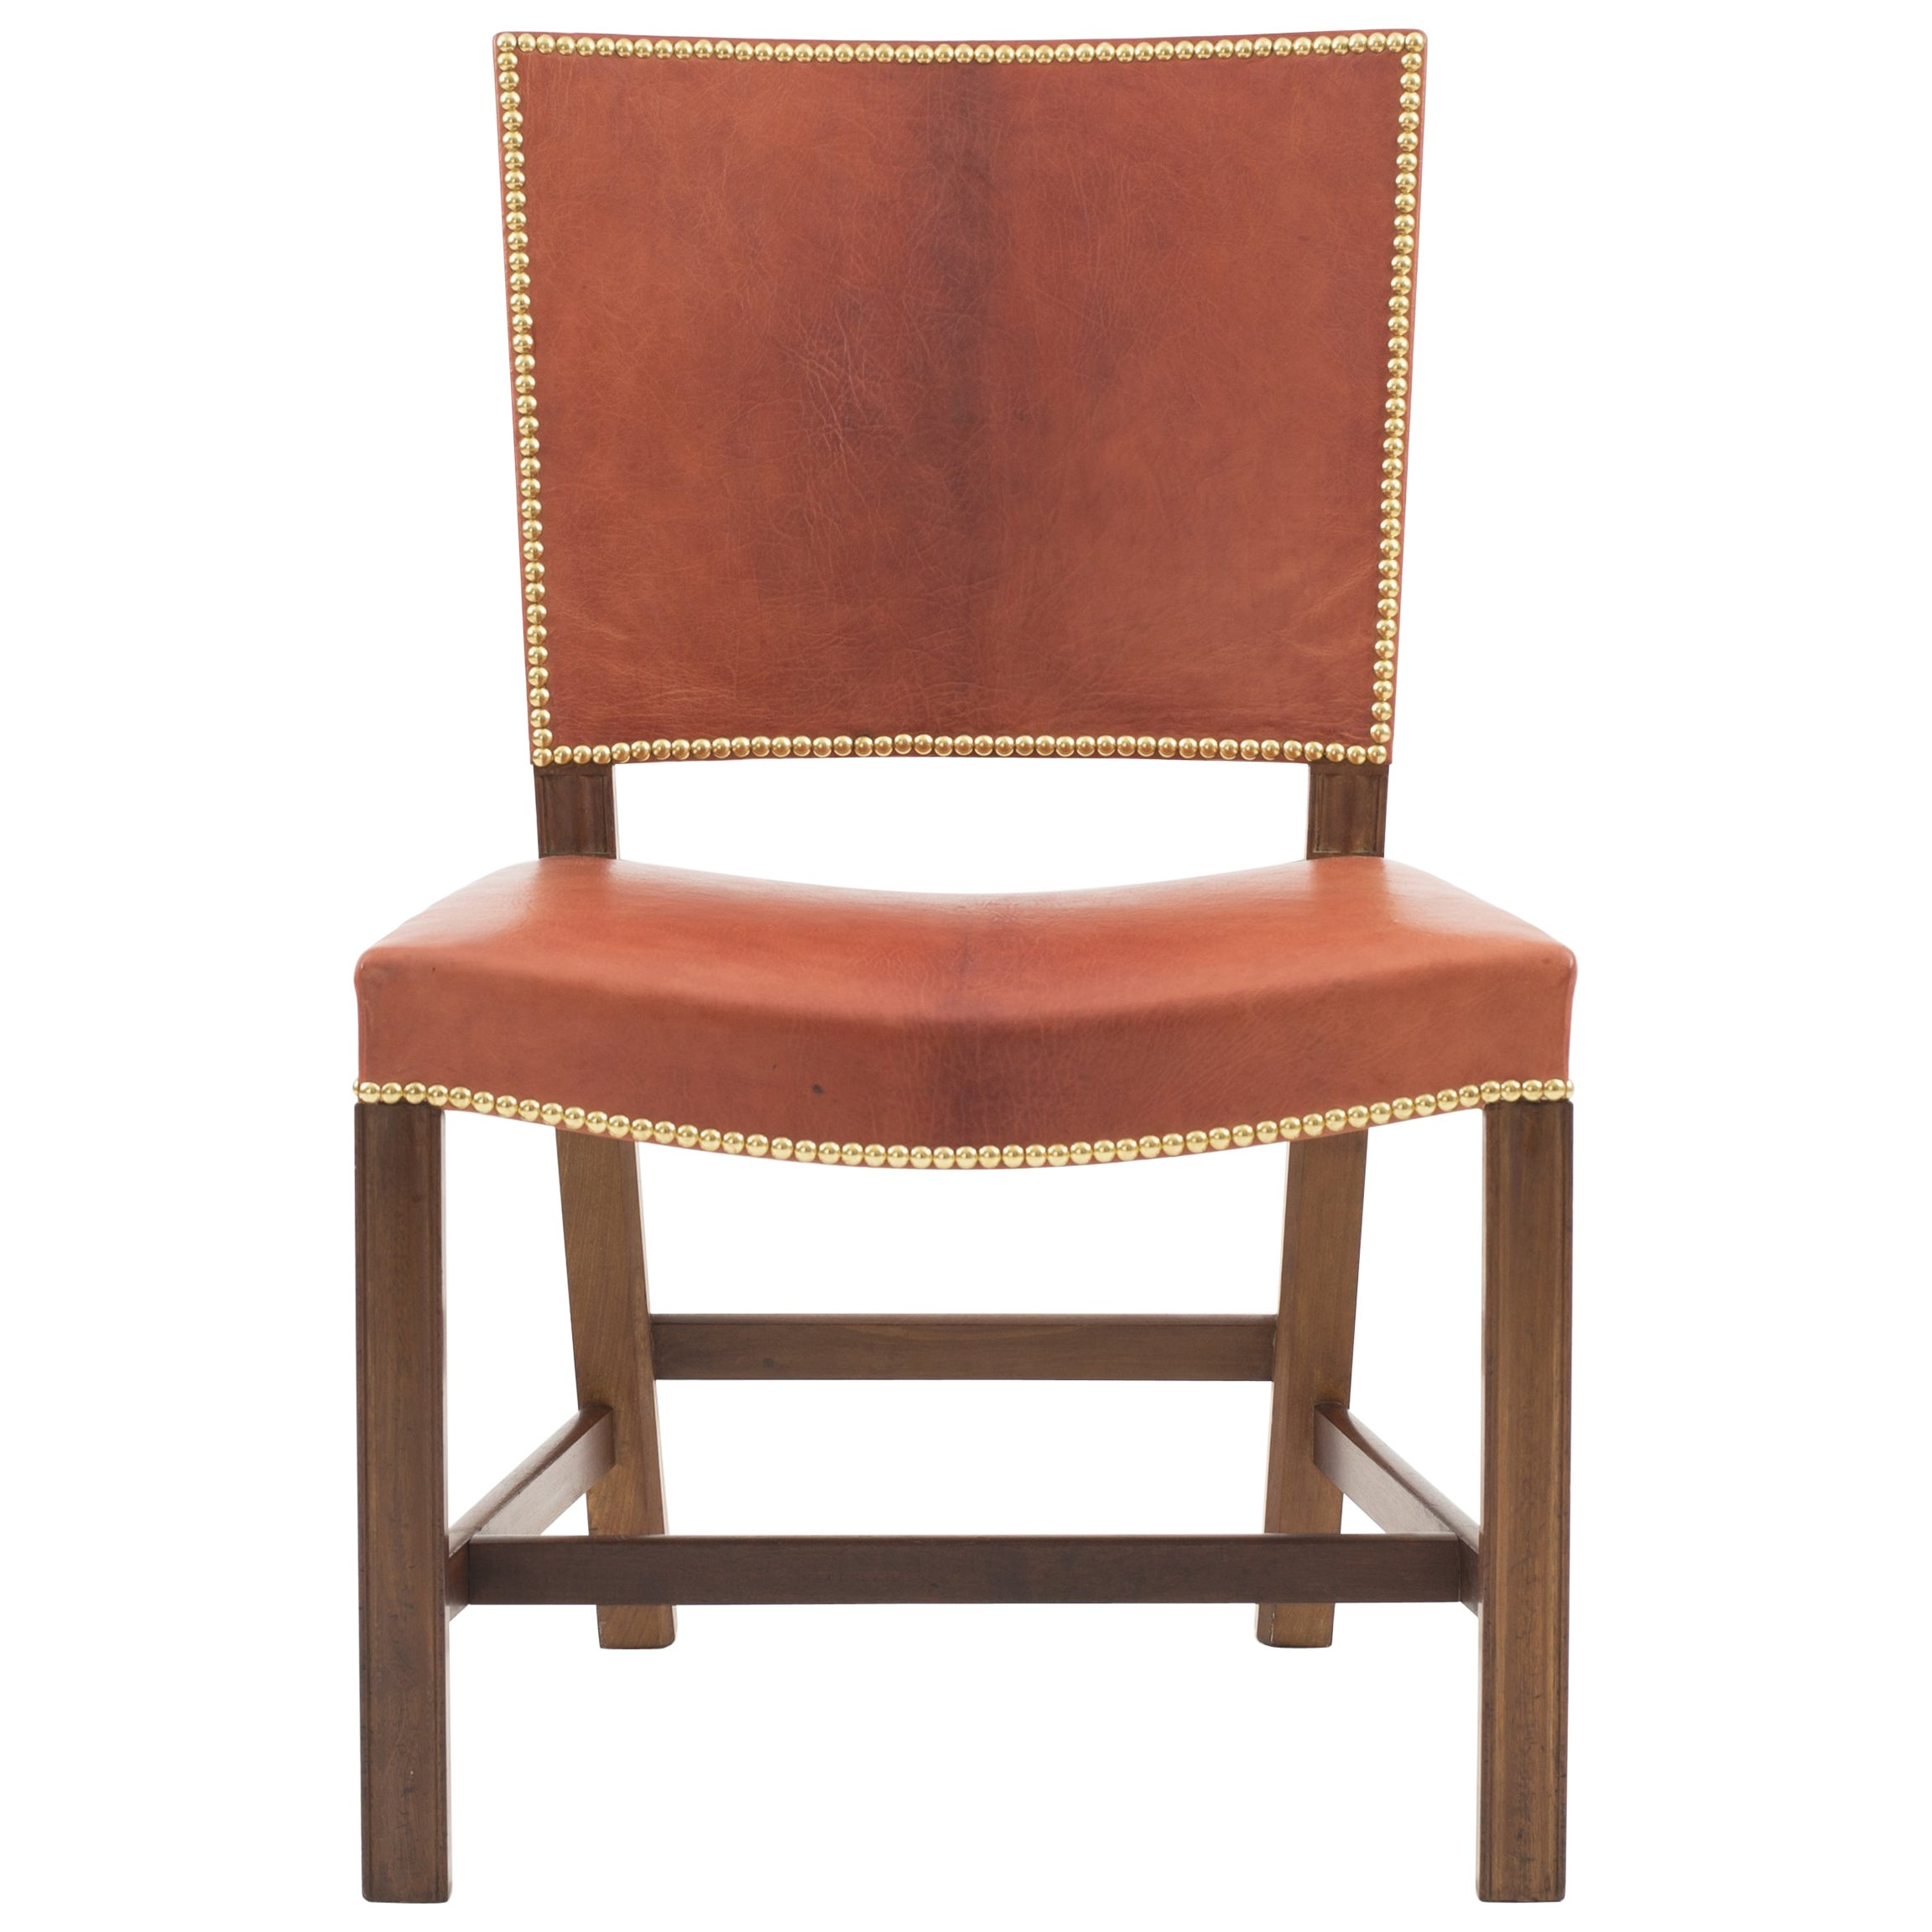 Kaare Klint Red Chair, Rud. Rasmussen, 1930s